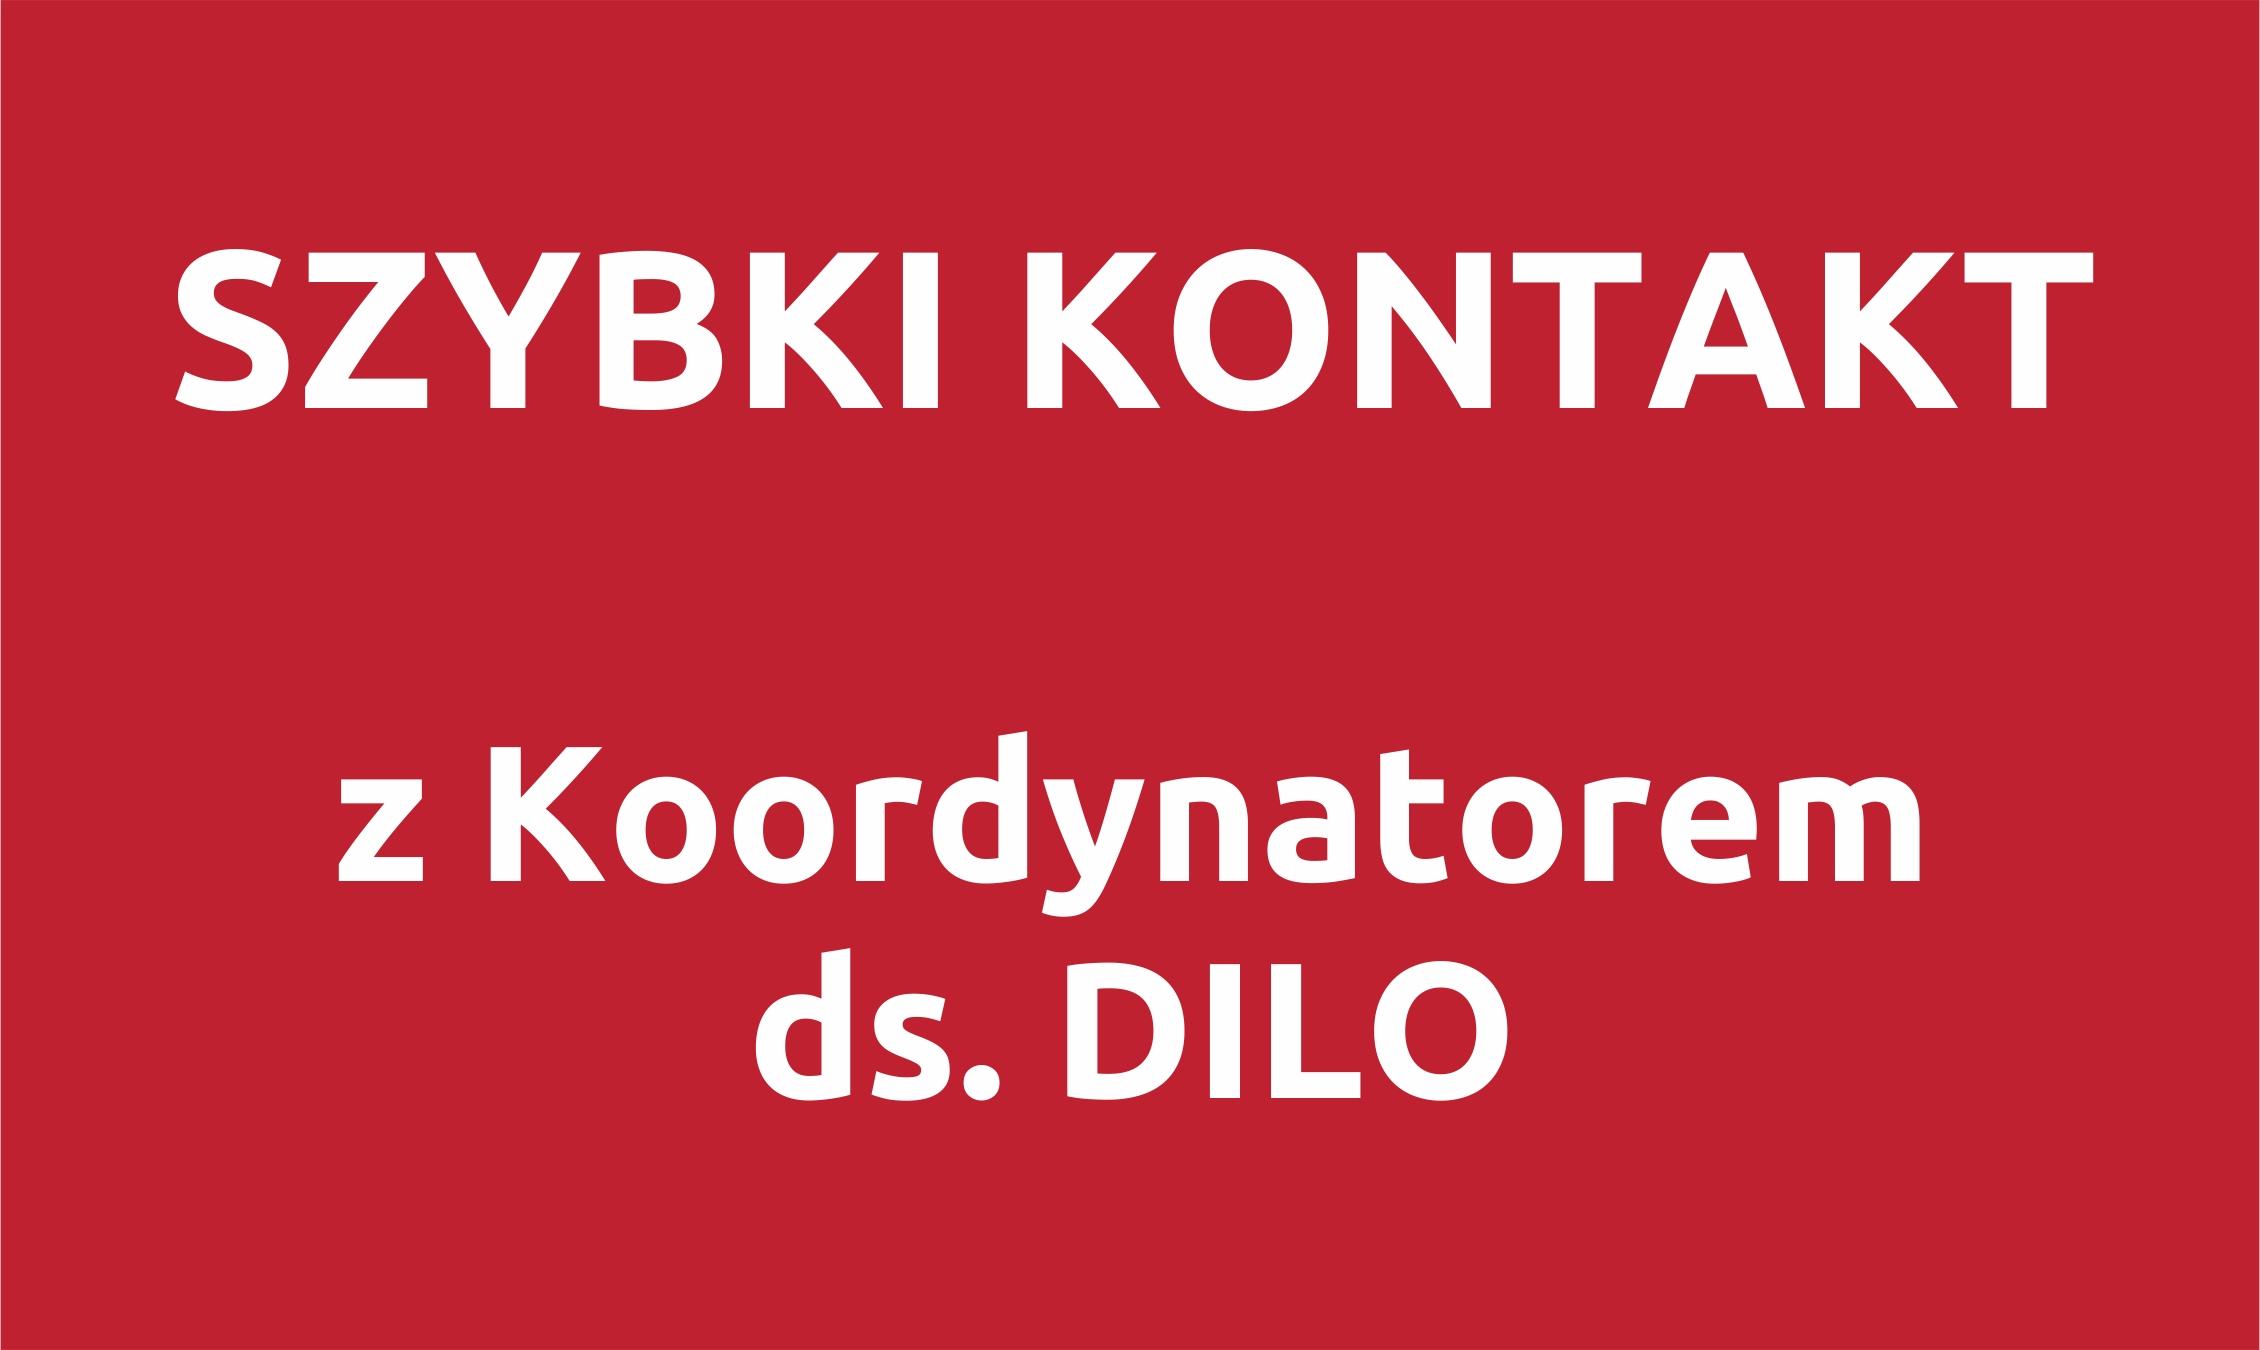 Koordynator ds.DILO